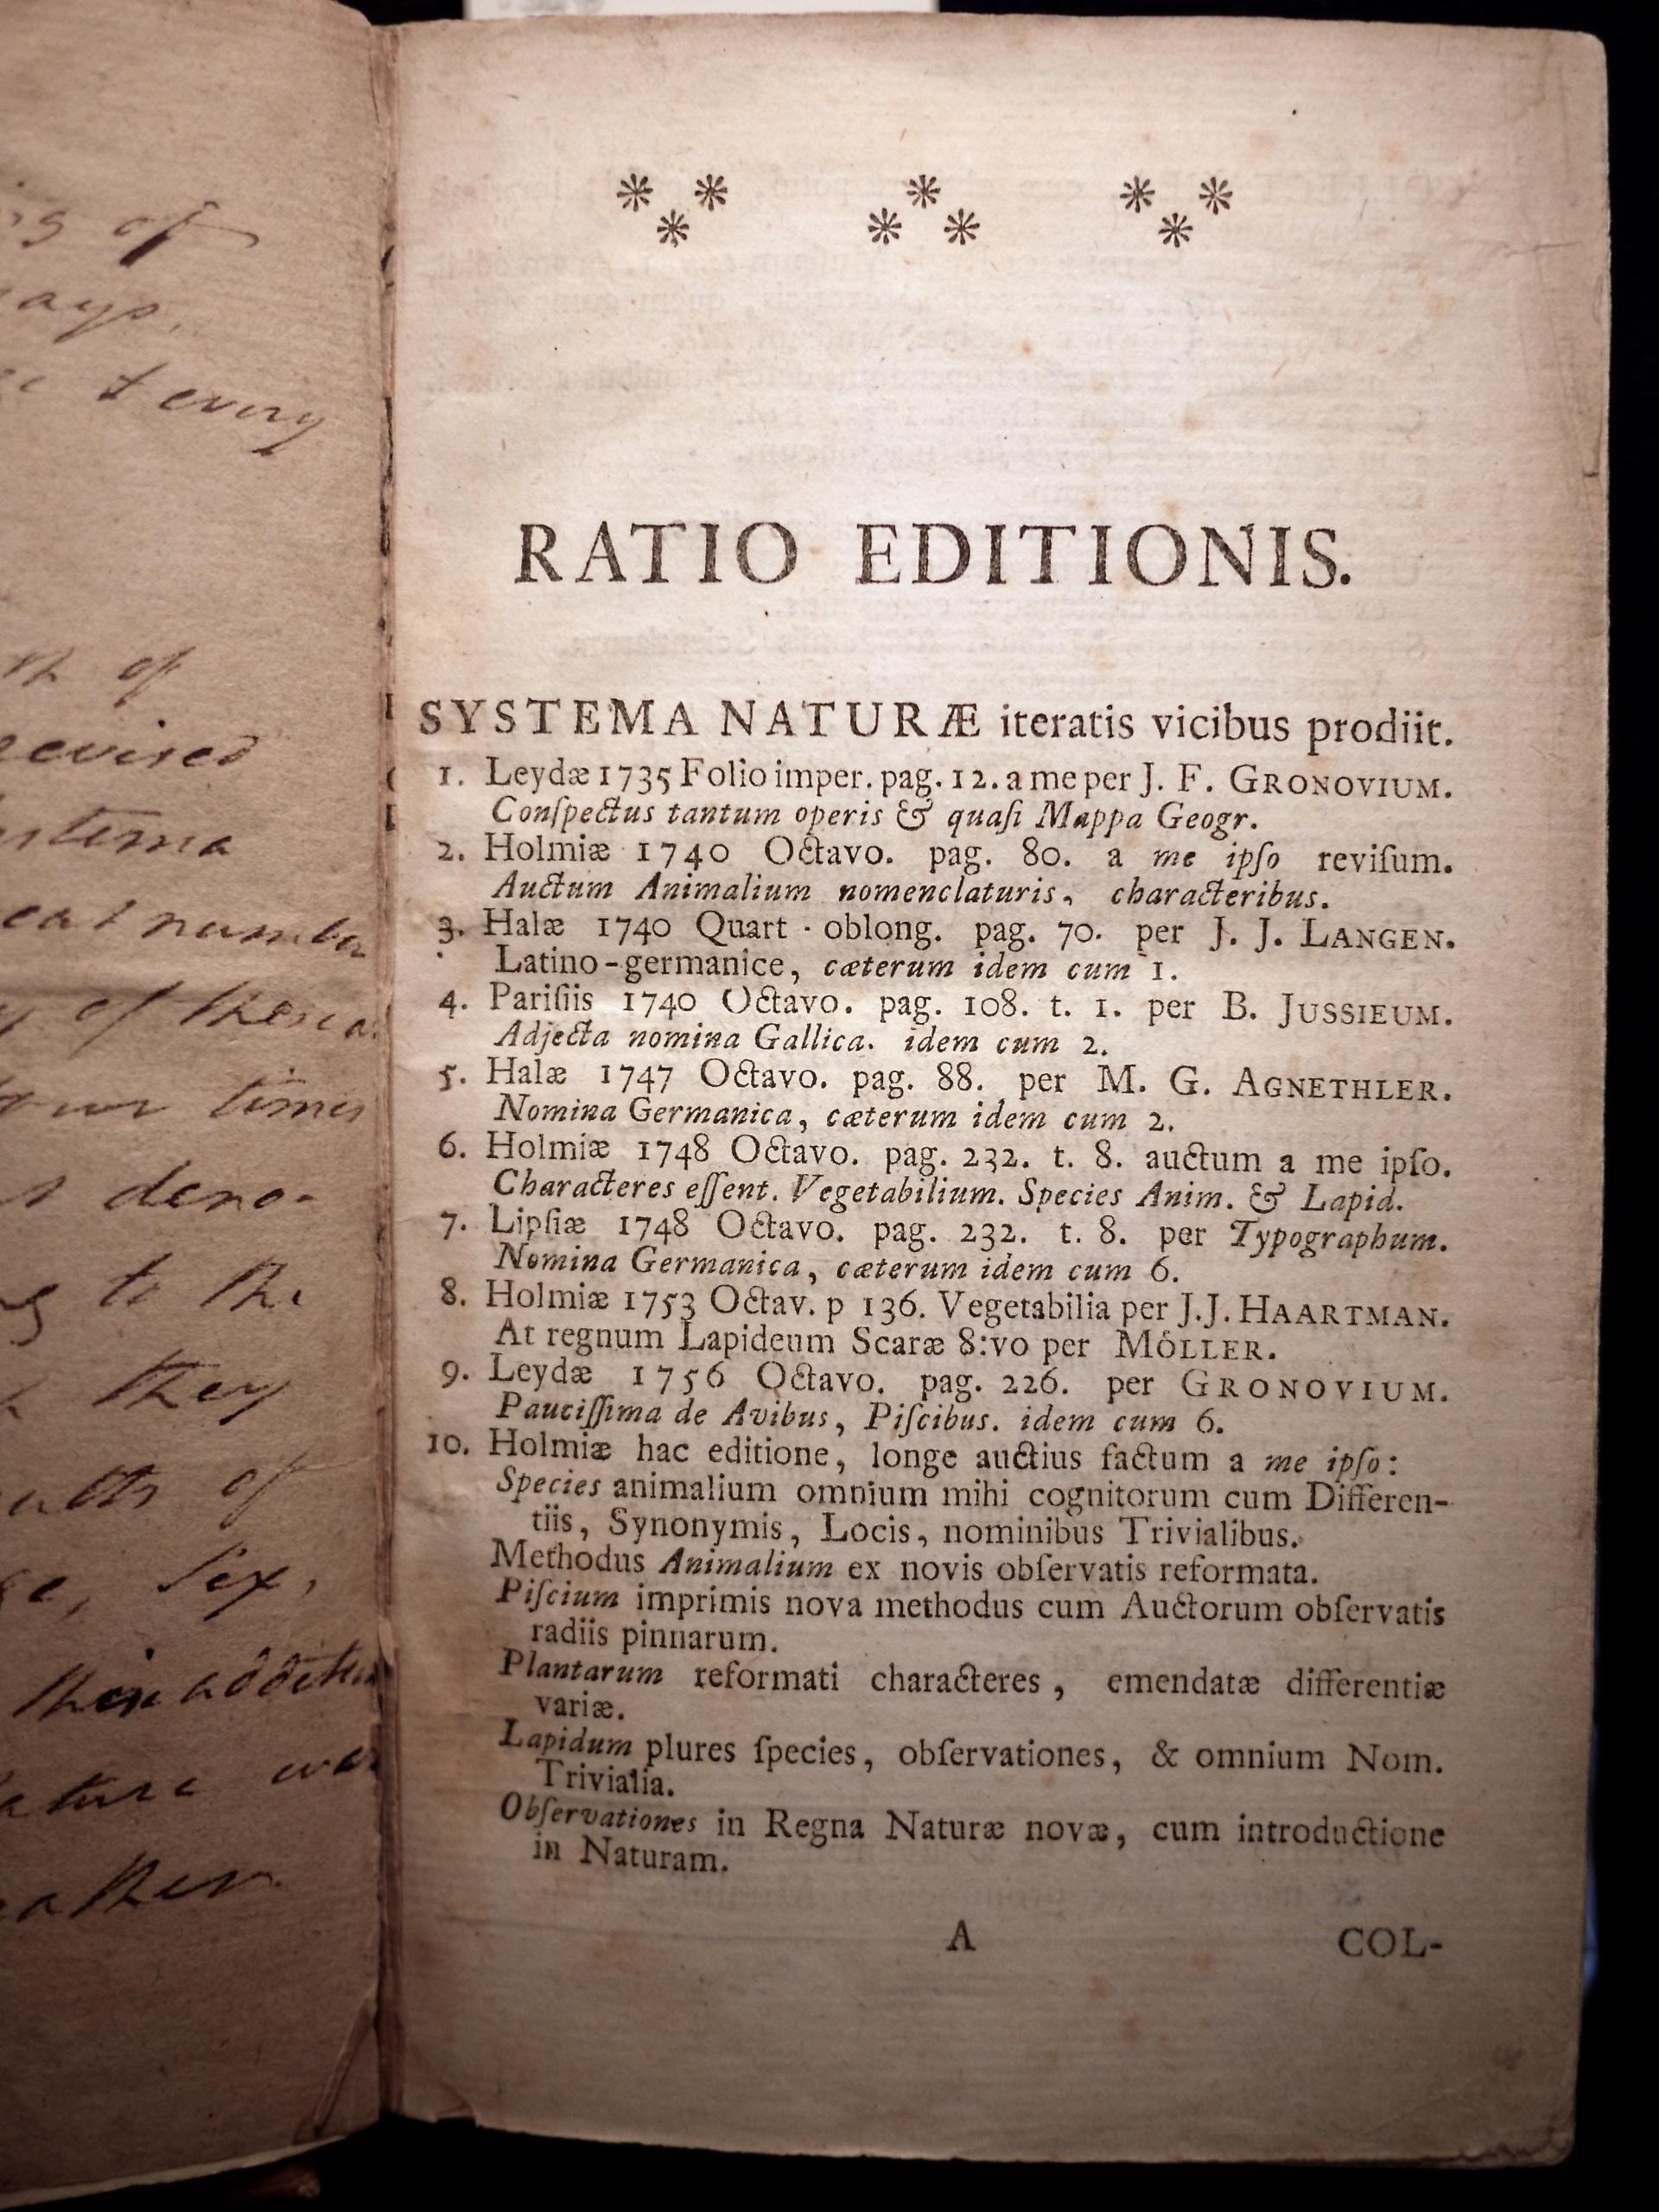 fig3-Linnaeus-RatioEditionis.jpg